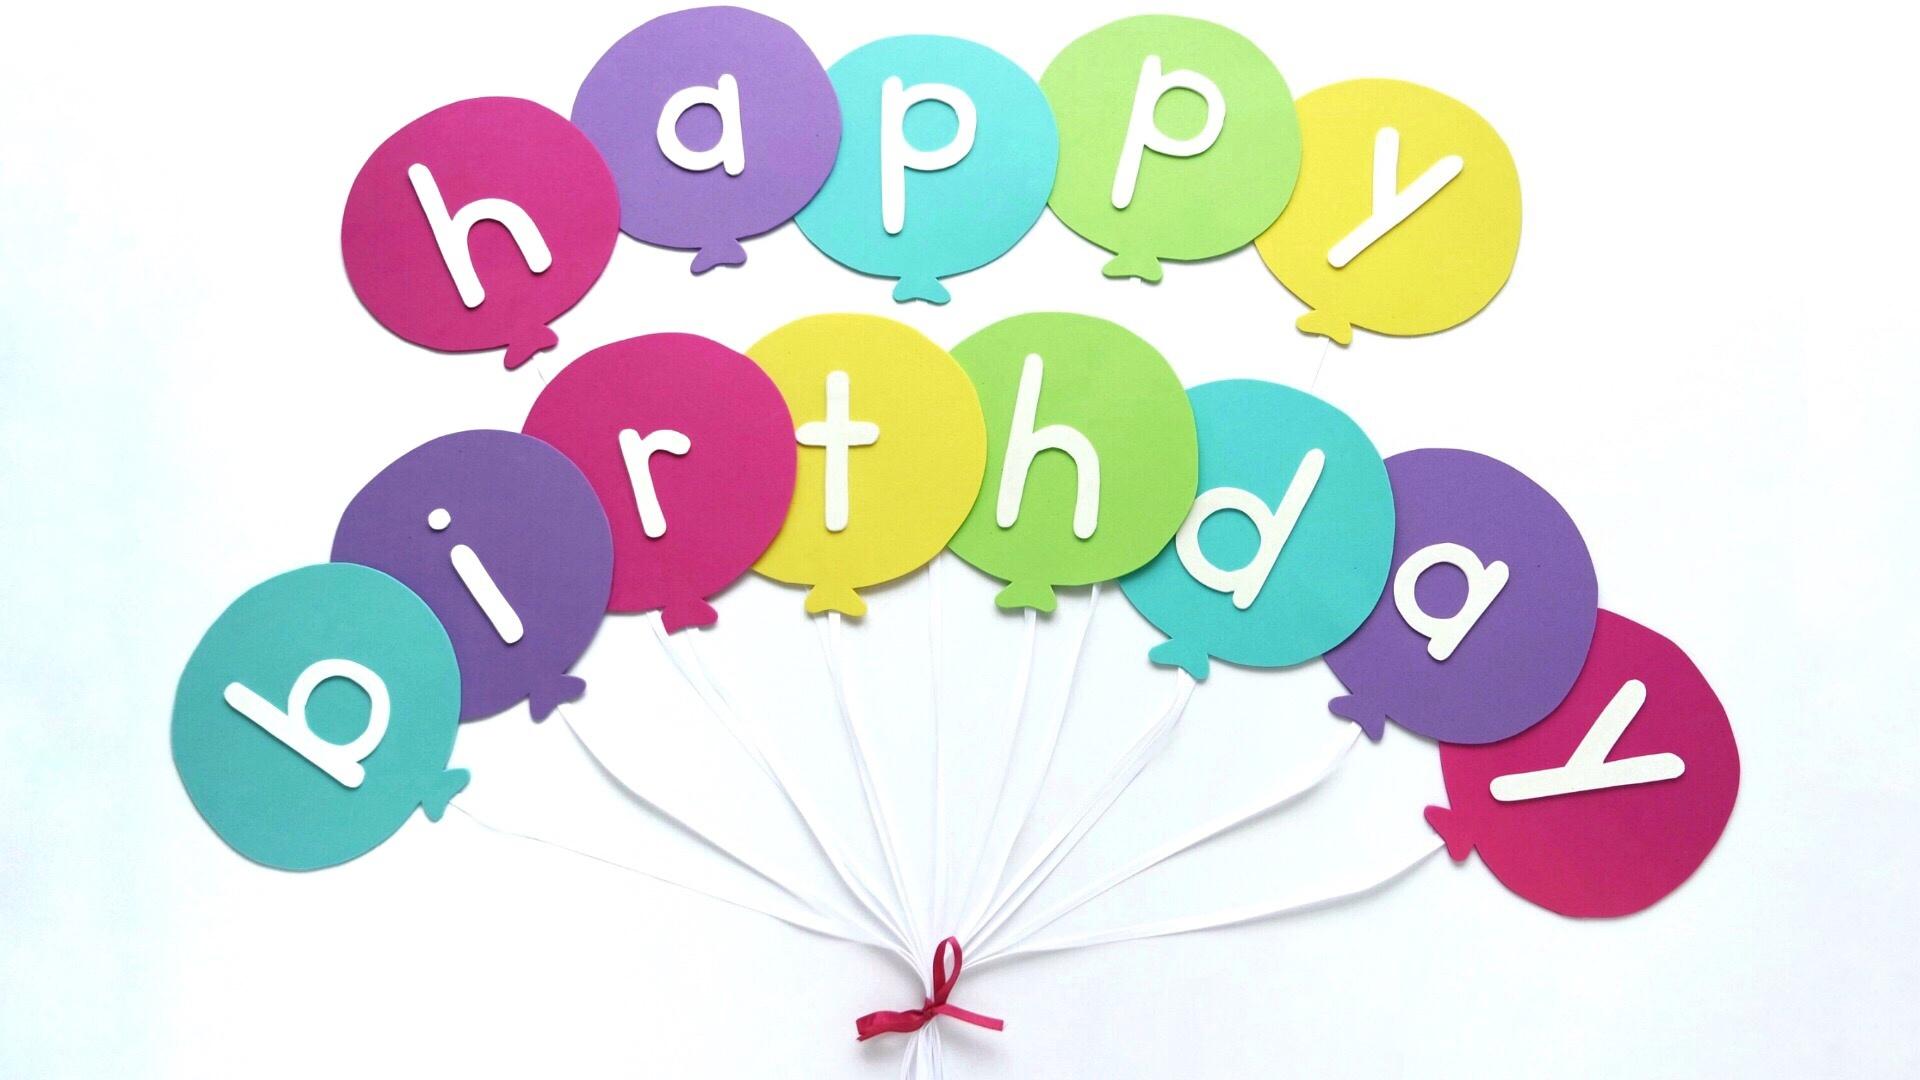 Happy Birthday Banner Diy Template | Balloon Birthday Banner Template - Free Printable Happy Birthday Banner Templates